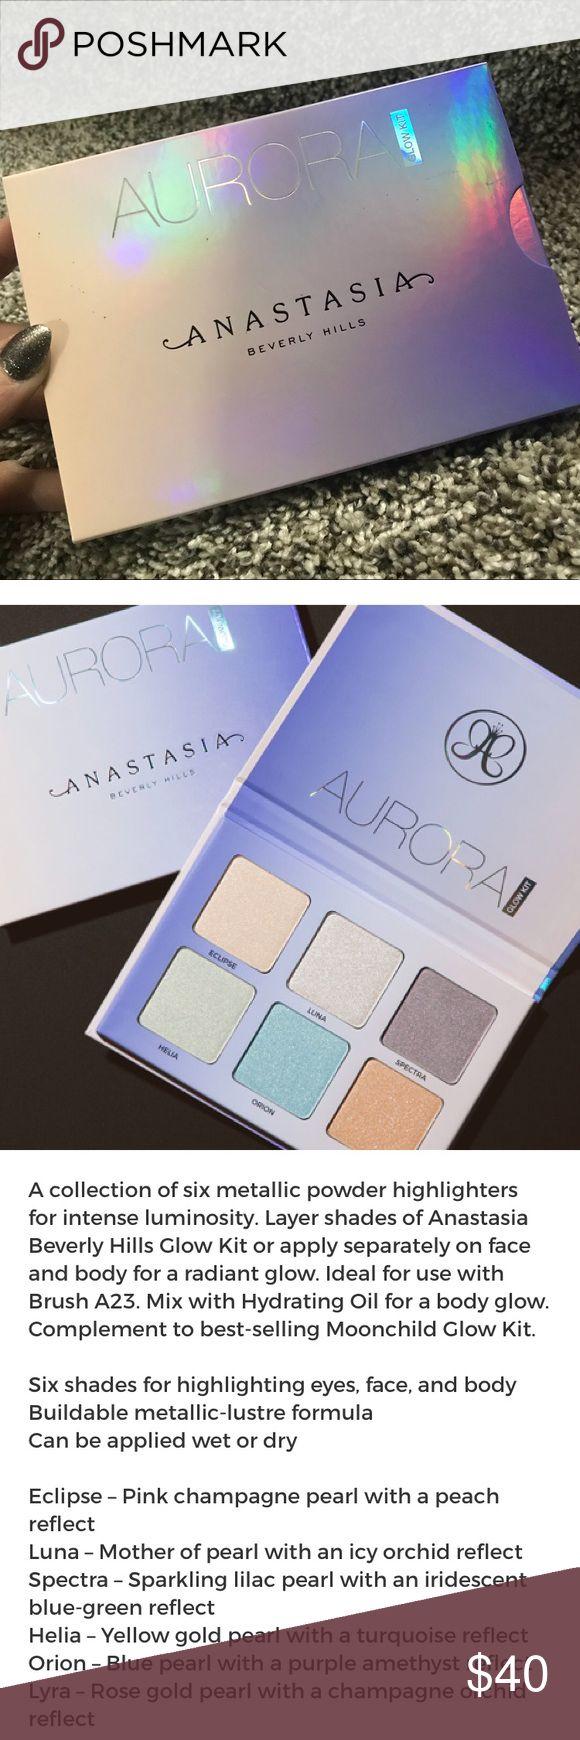 Anastasia BH AURORA glow kit Authentic. Brand new Glow kit from ABH. Anastasia Beverly Hills Makeup Luminizer